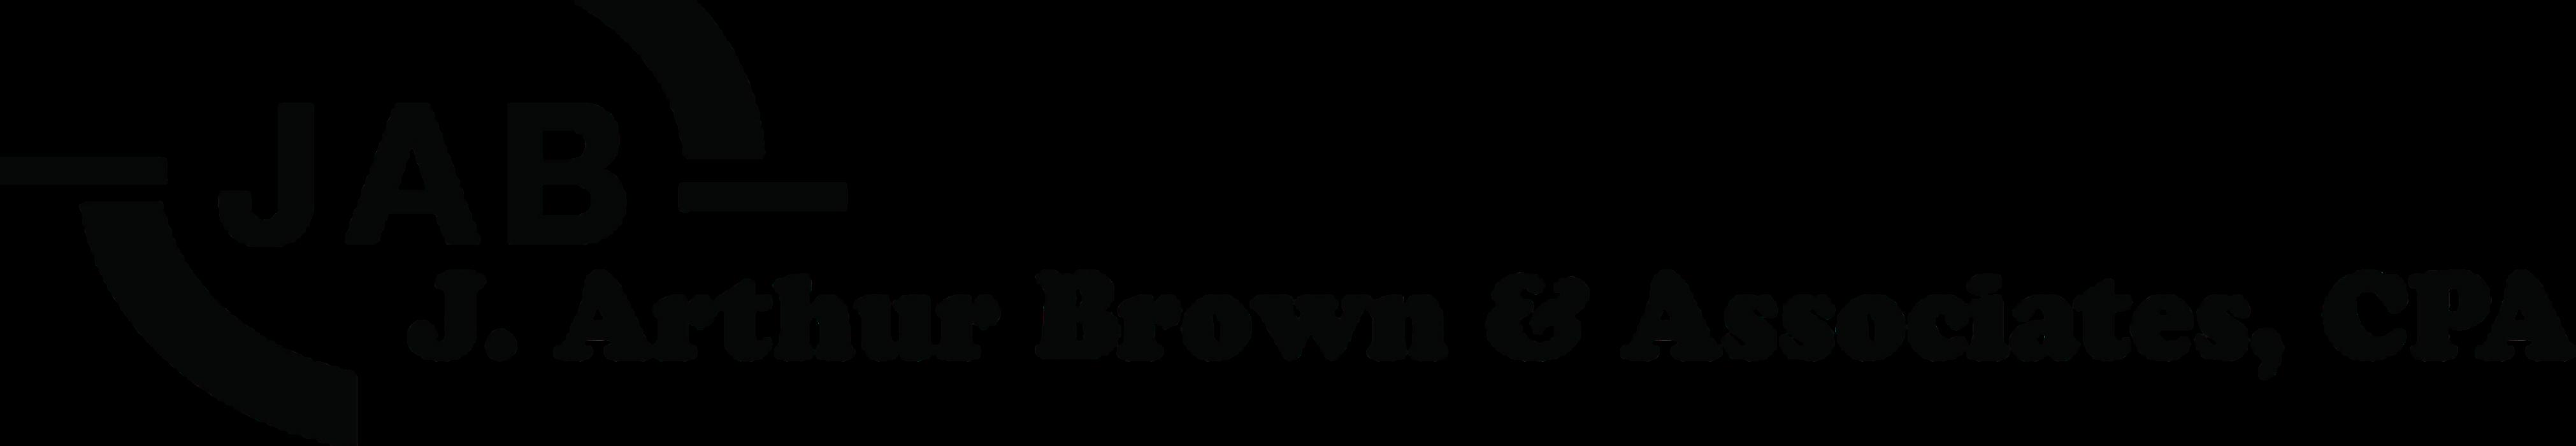 J. Arthur Brown & Associates, CPA - Temple Hills, MD